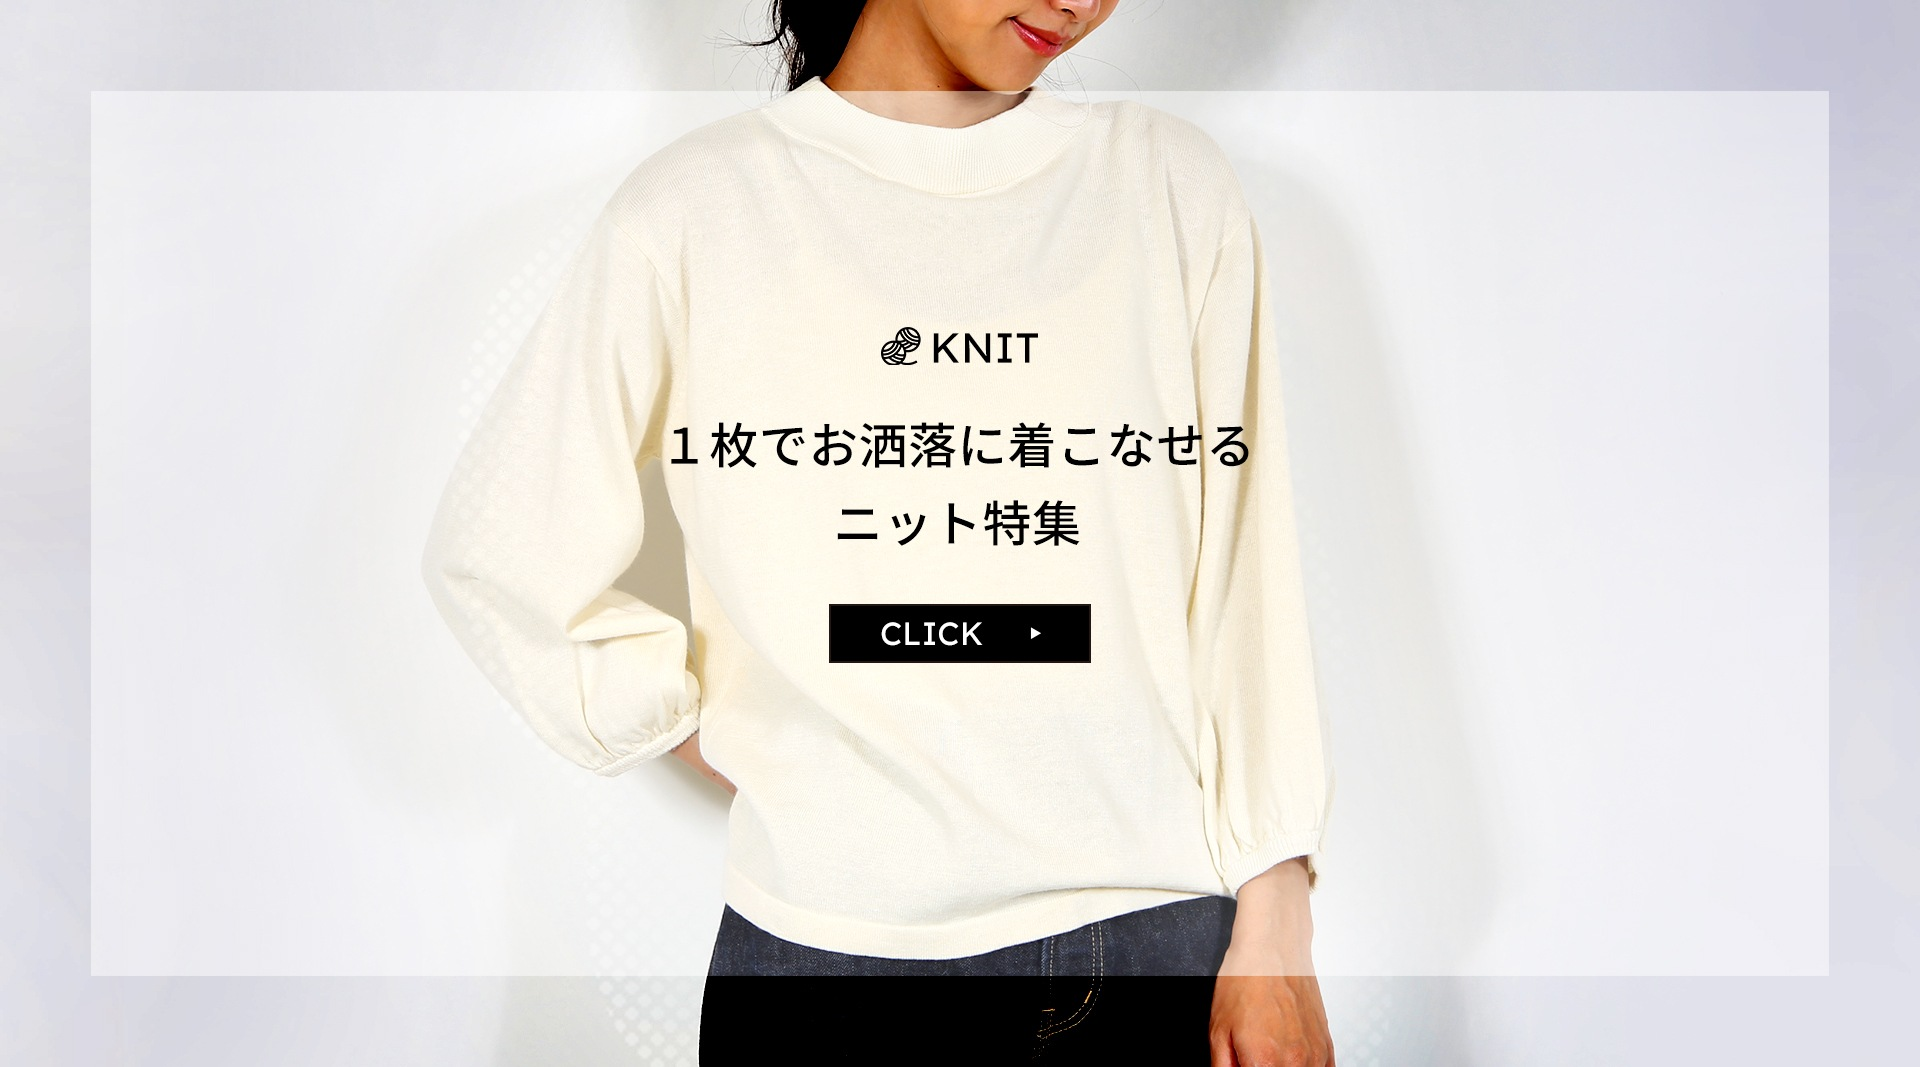 jolie-clothes ニット特集